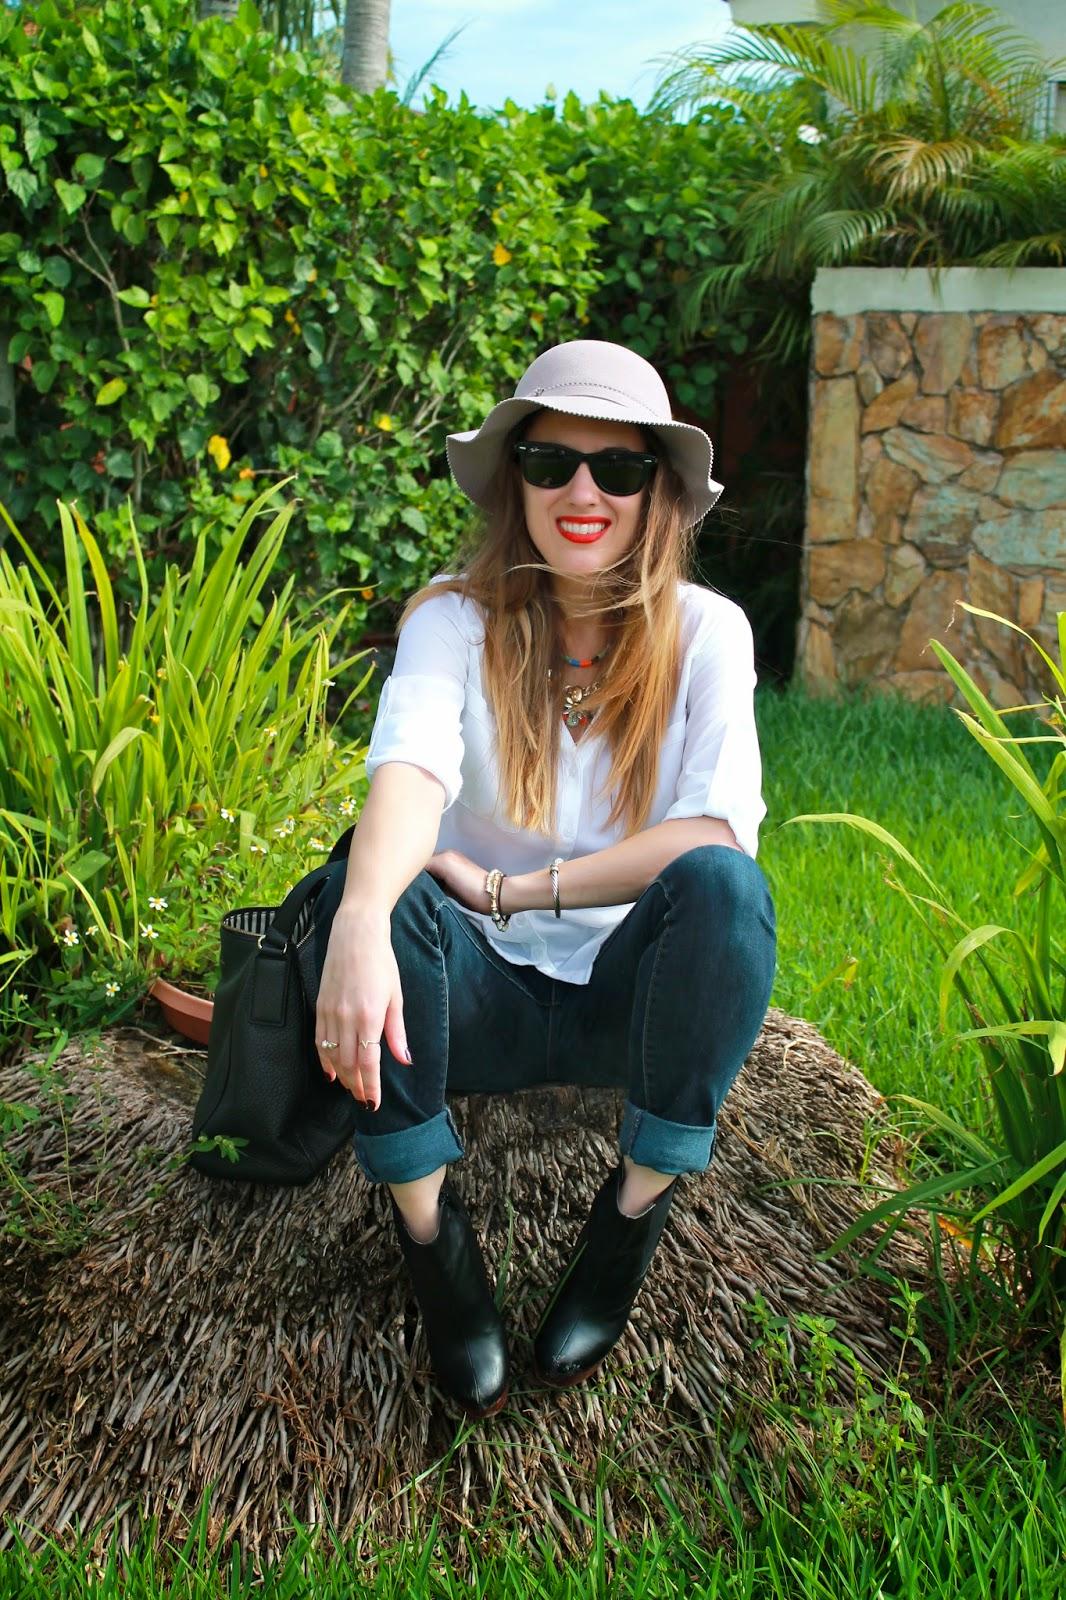 Express, Levi's, BCBGeneration, Kate Spade, Ray-Ban, style, fashion, fashion blog, style blog, ootd, look book, blogger style, Miami fashion blog, Miami fashion blogger